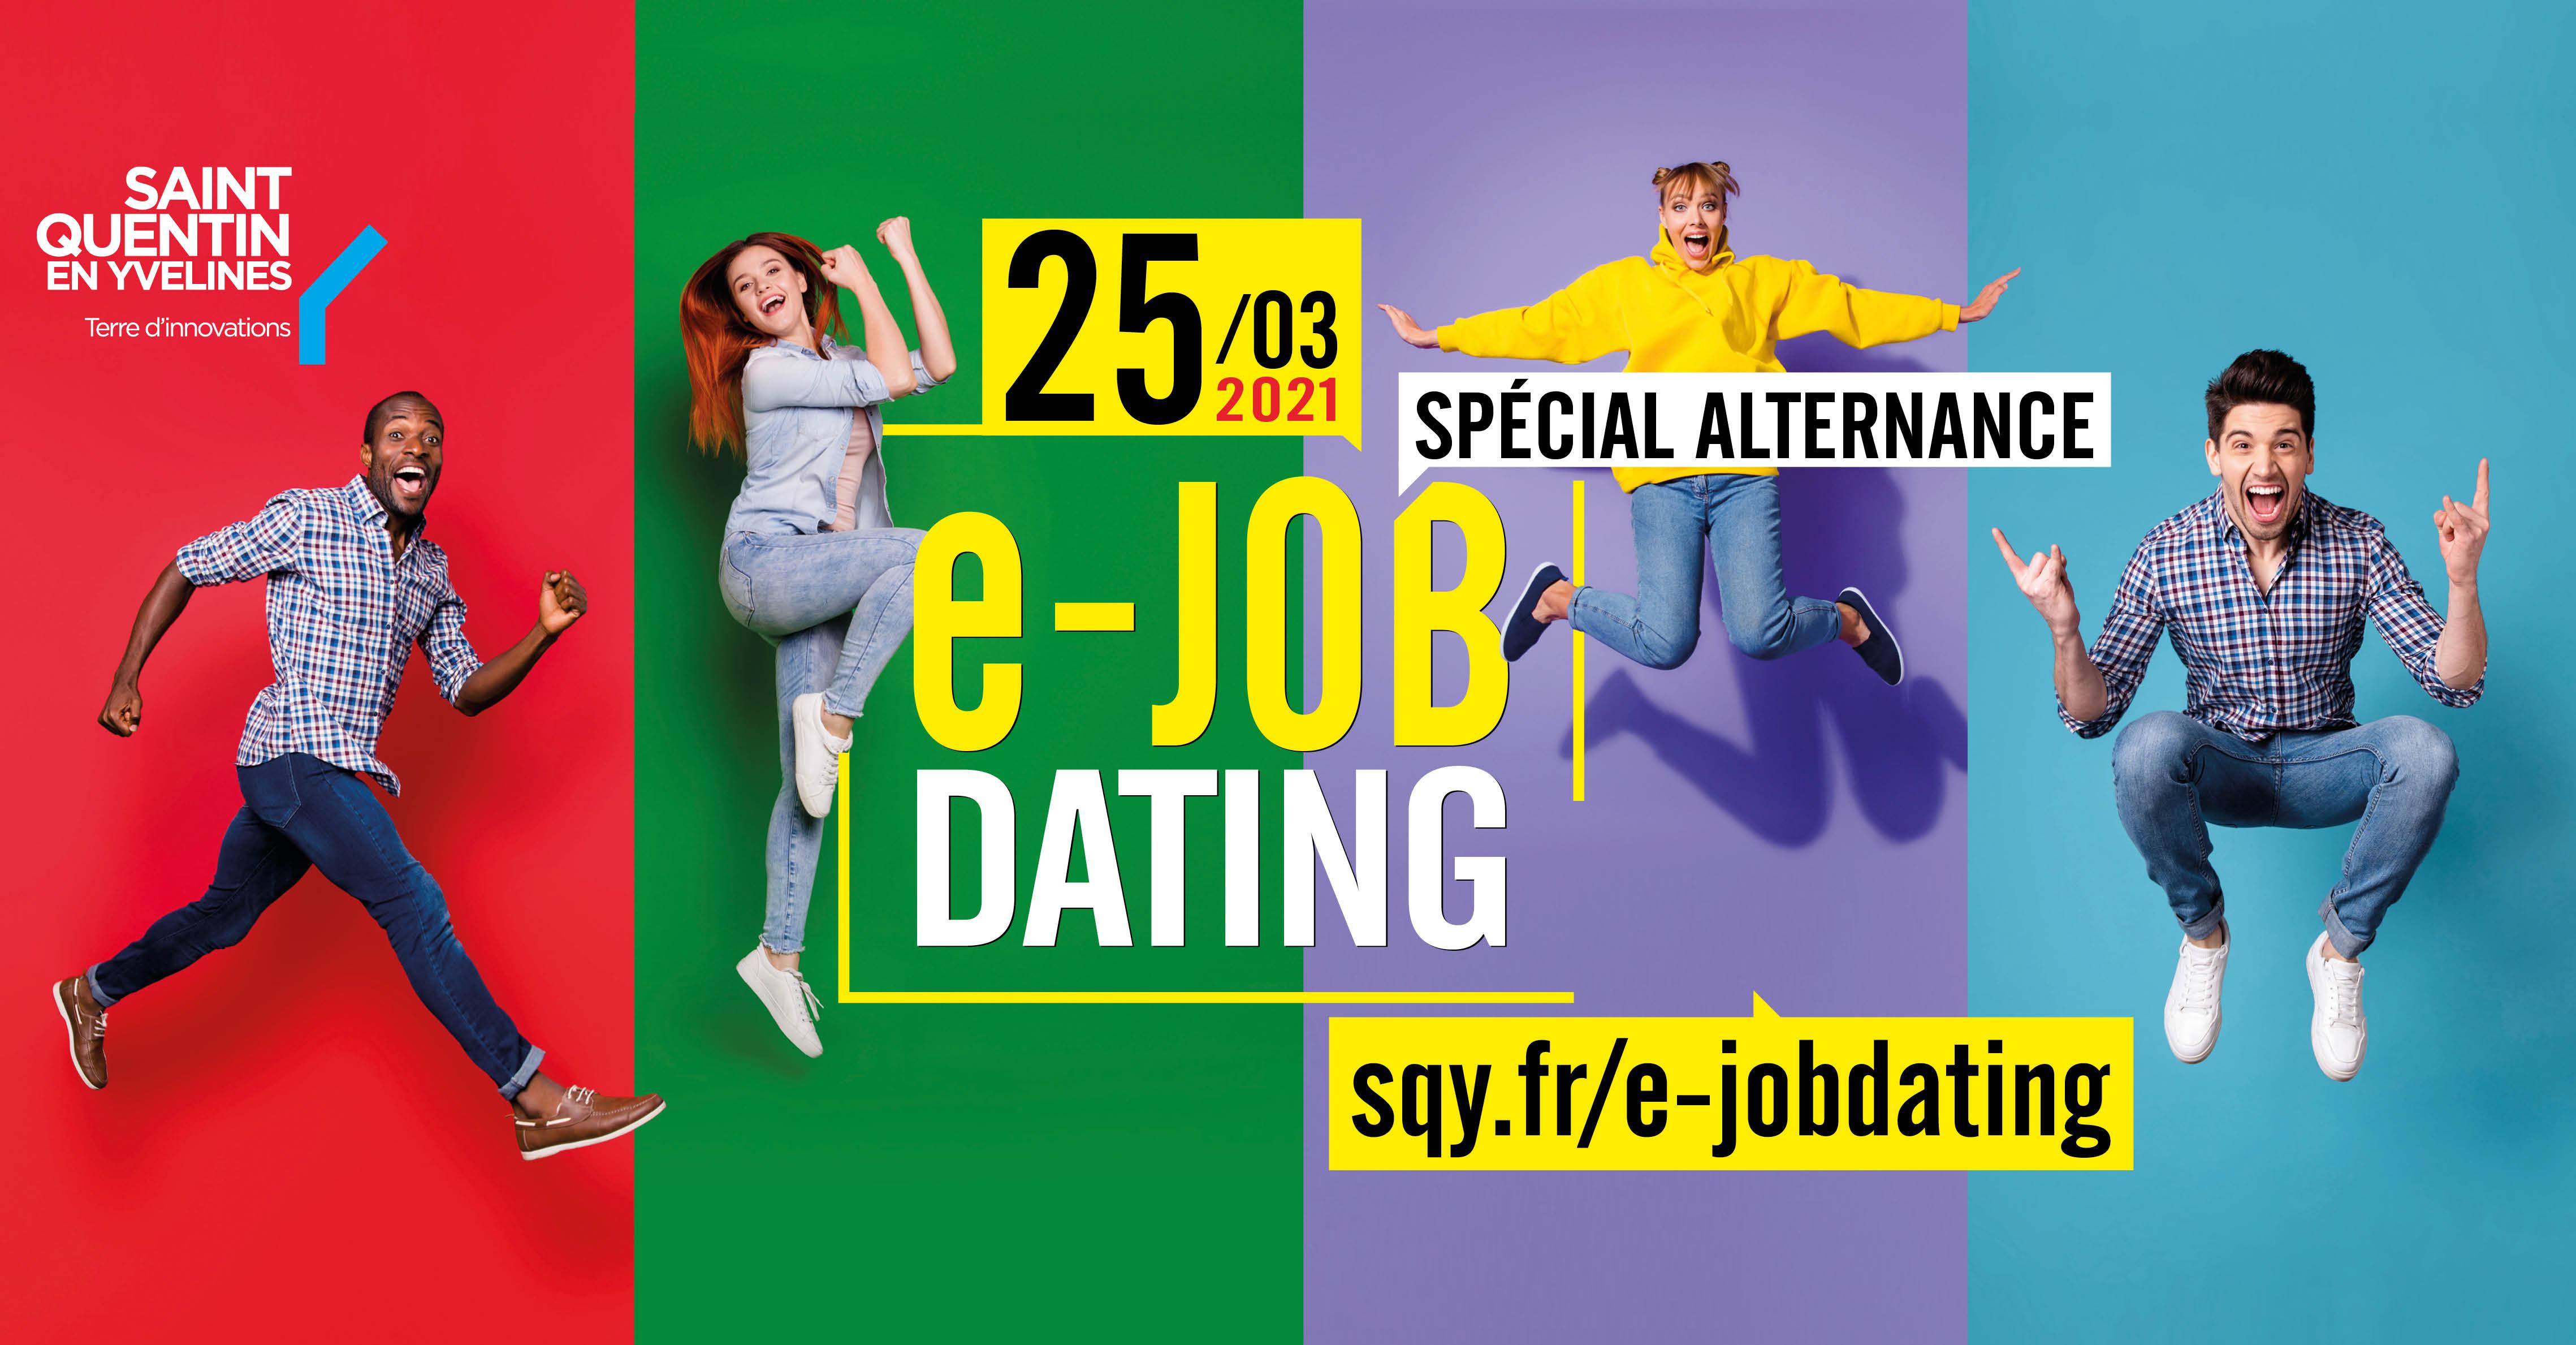 e-job dating